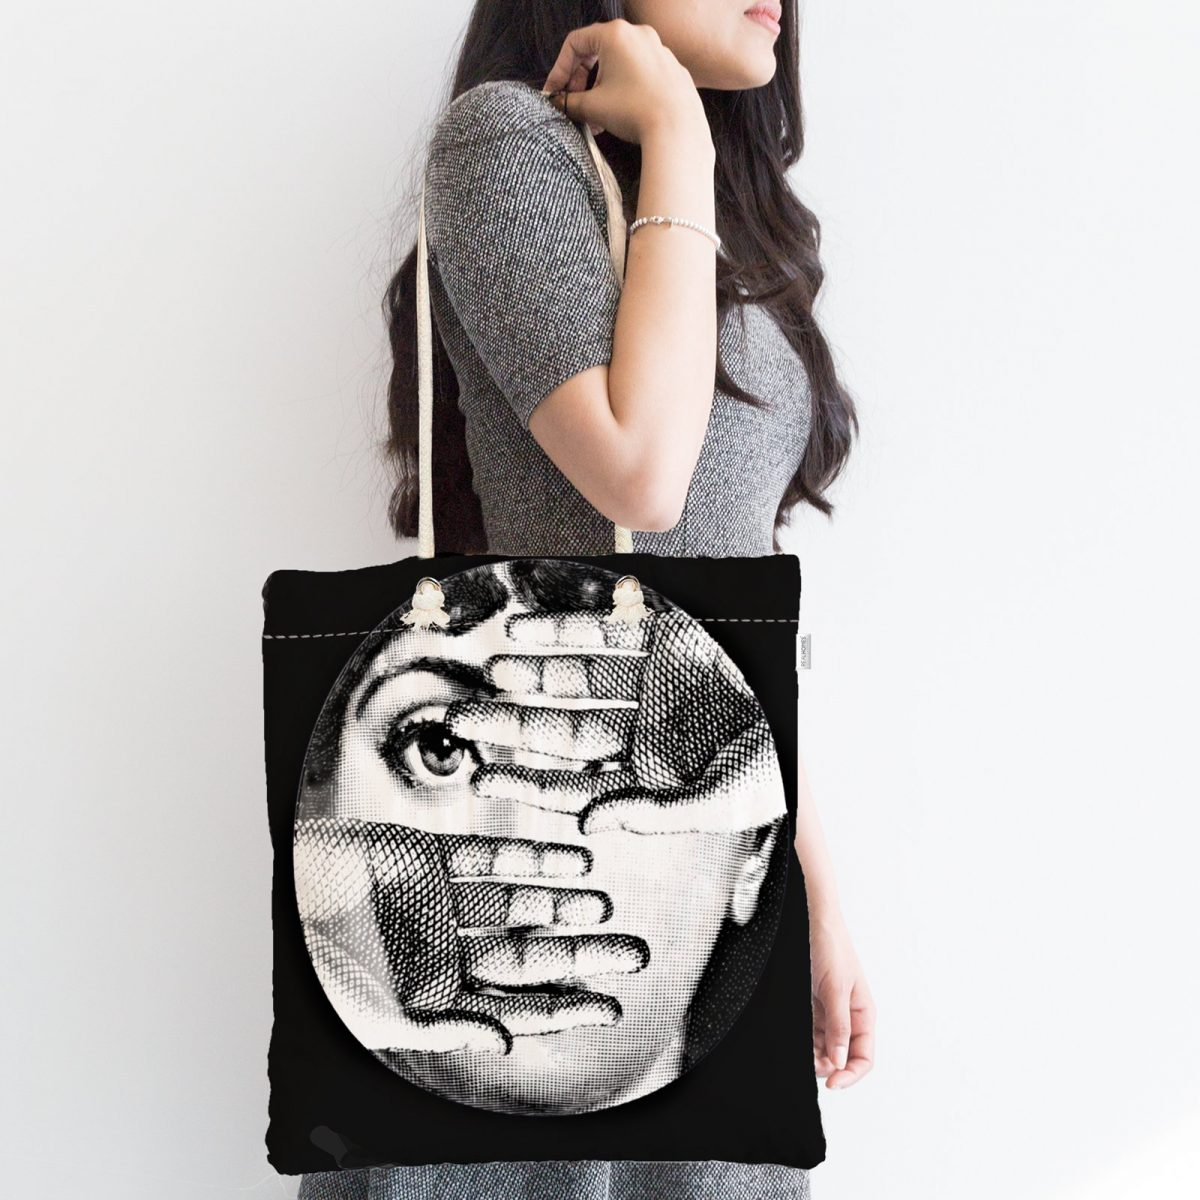 Siyah - Beyaz Fornosetti Tasarımlı Modern Fermuarlı Modern Kumaş Çanta Realhomes